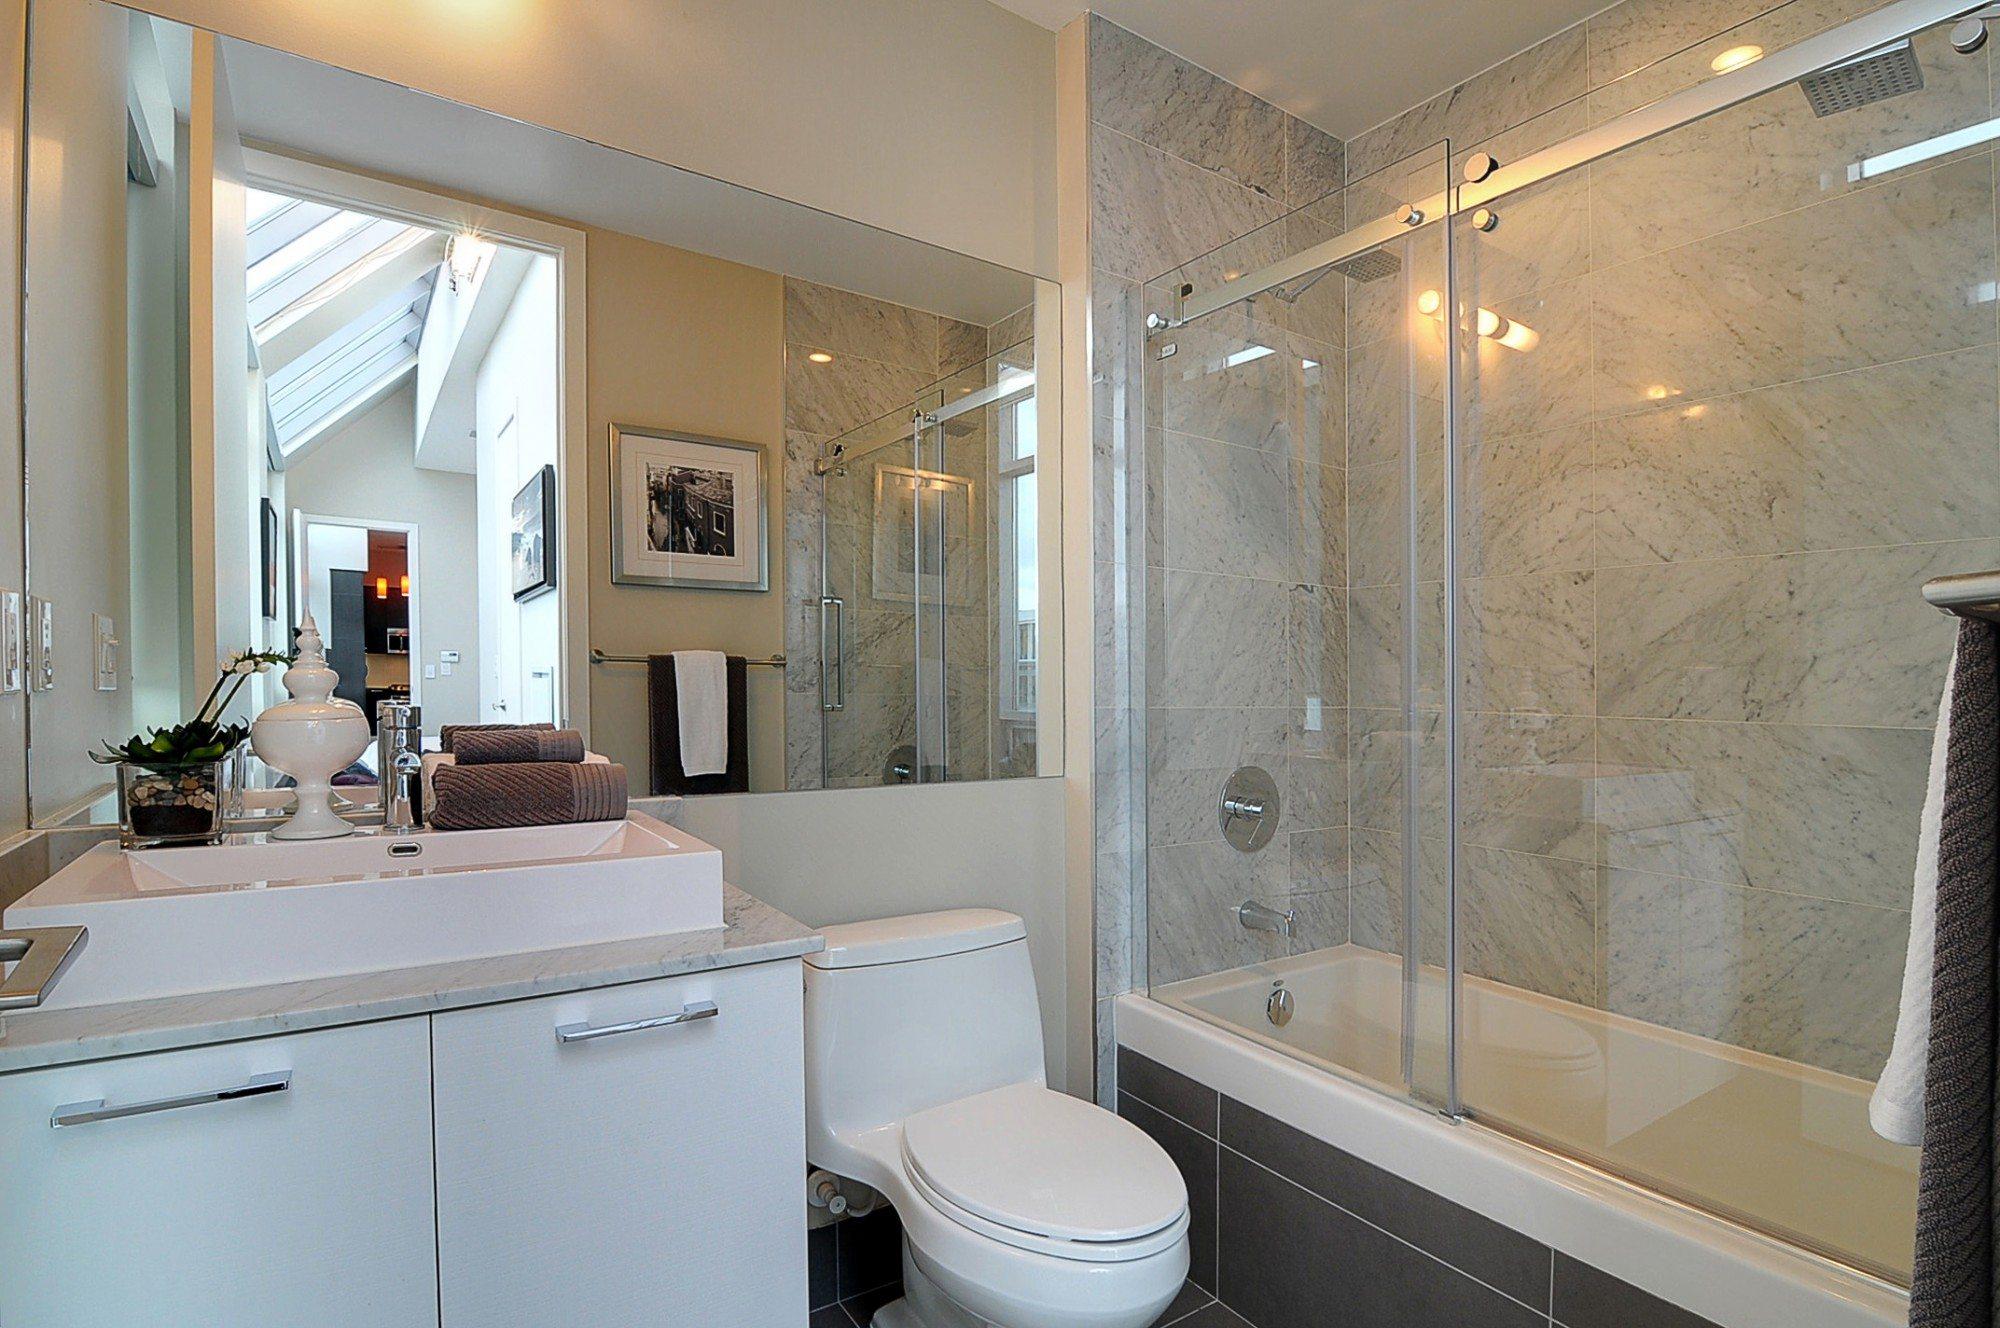 toronto-condo-for-sale-399-adelaide-street-west-master-bathroom